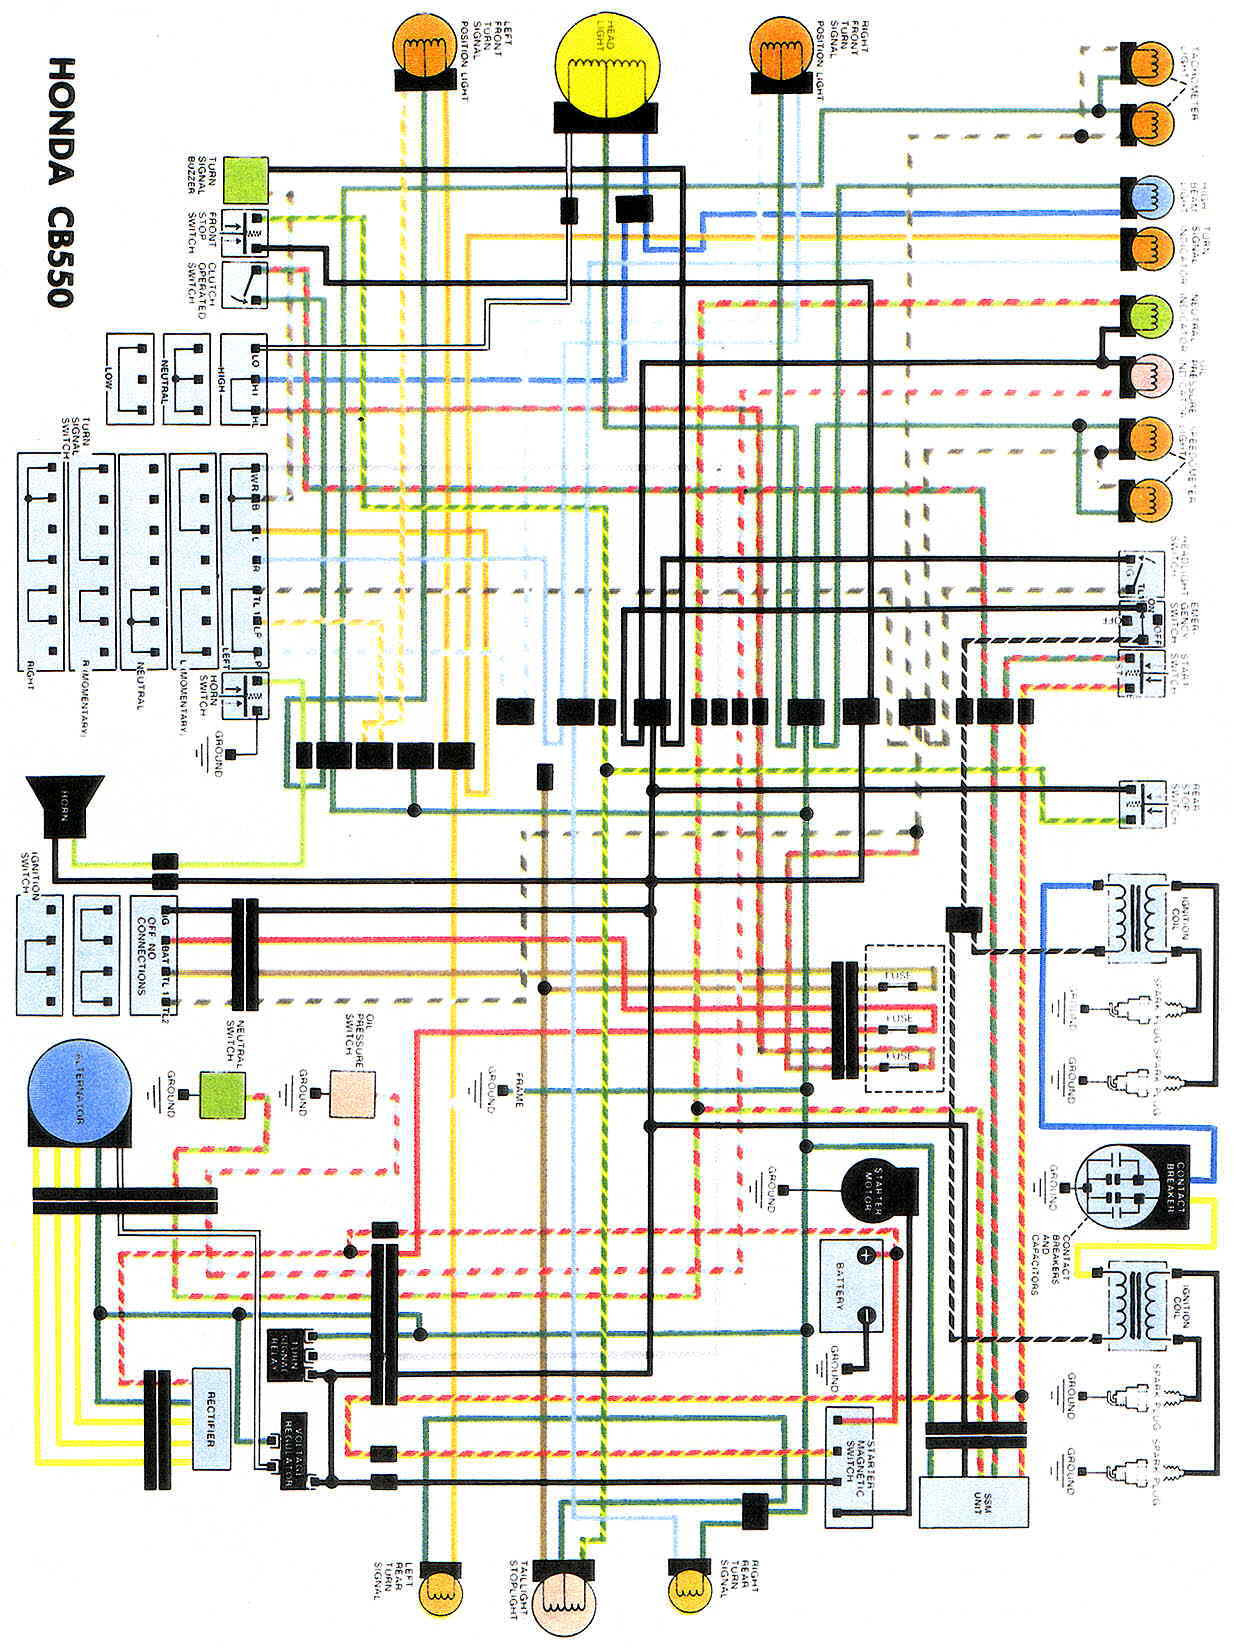 Bmw F650 Funduro Wiring Diagram - Wiring Diagram and Schematic